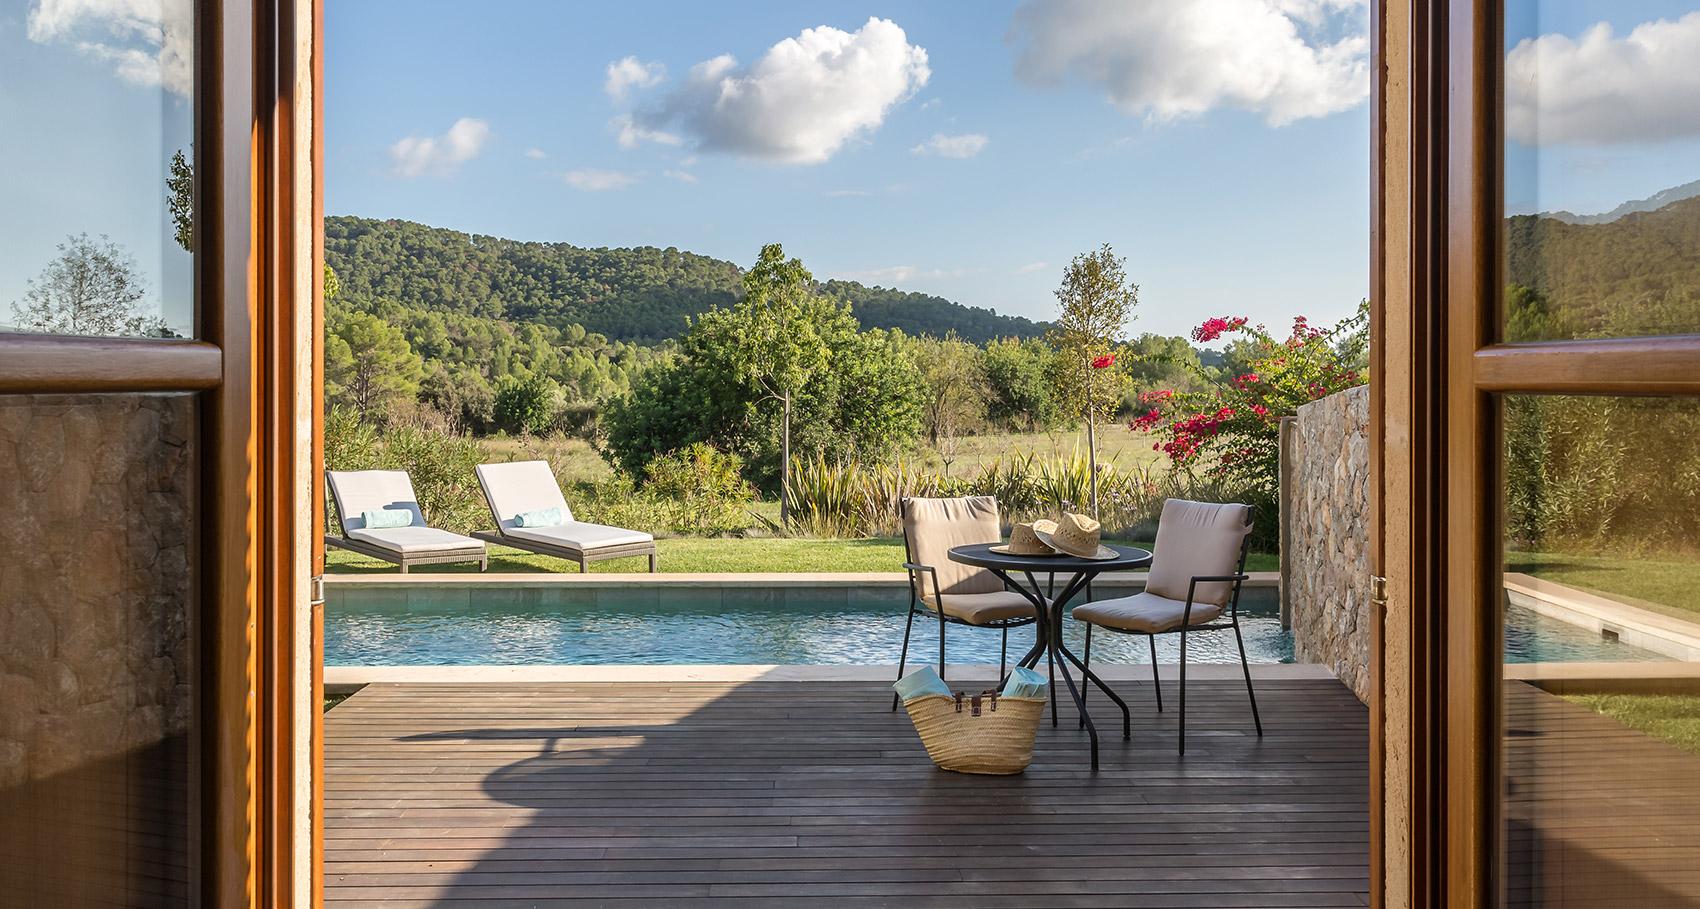 FINESSE, Magazin, Travel, Gourmet, Food, Mallorca, Hotel, Castell Son Claret, Luxusurlaub, Luxusrefugium, Inmobiliaria